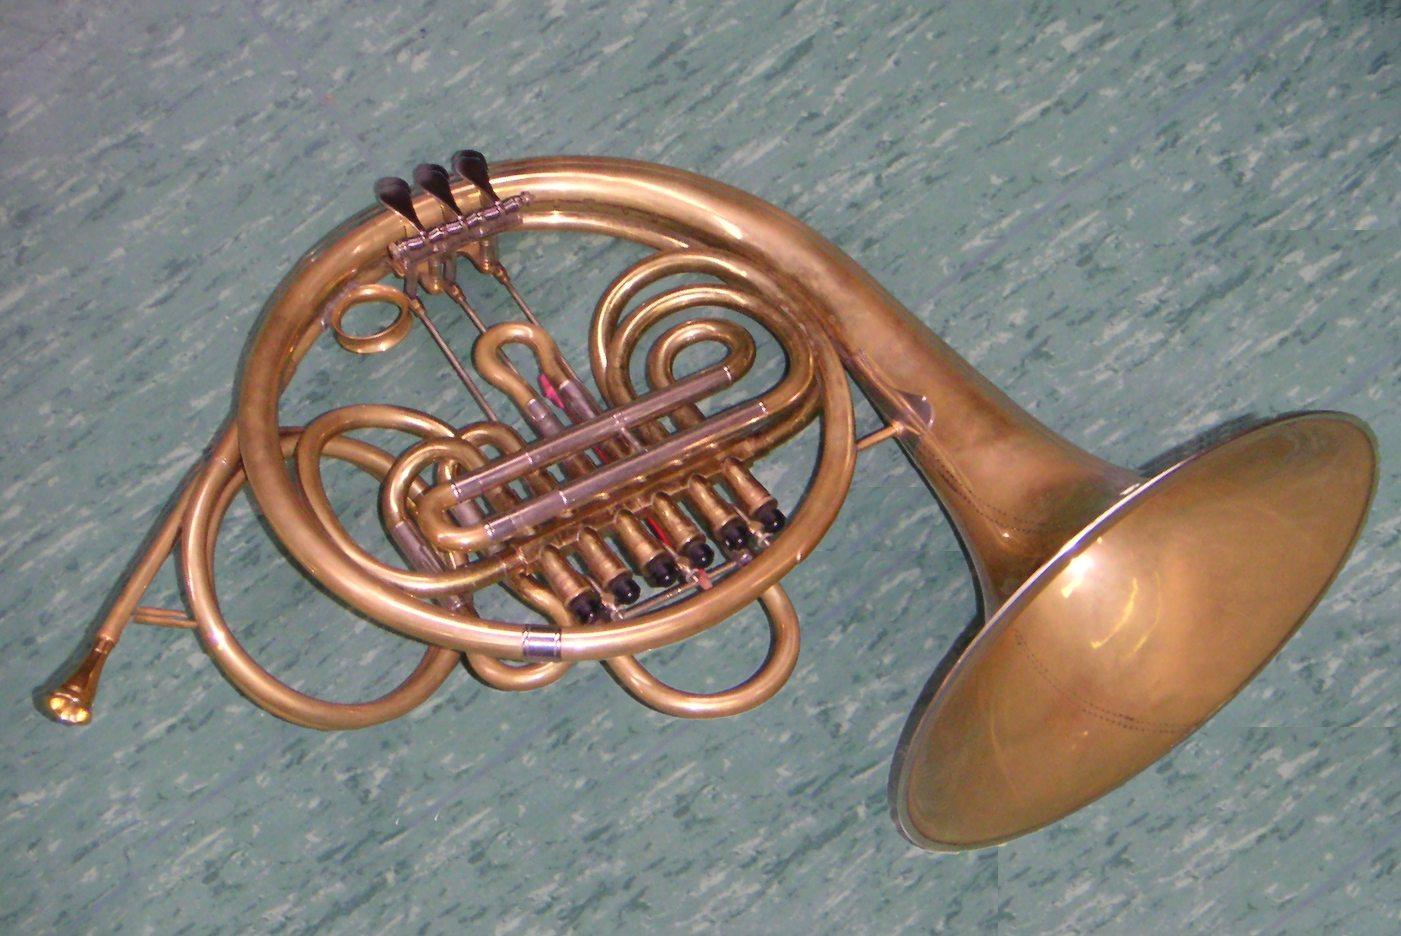 history of the french horn Valves christian friedrich sattler, piston valve, 1821 friedrich blümel, rotary valve only two valves to start with still needed 2 crooks hand-stopping.